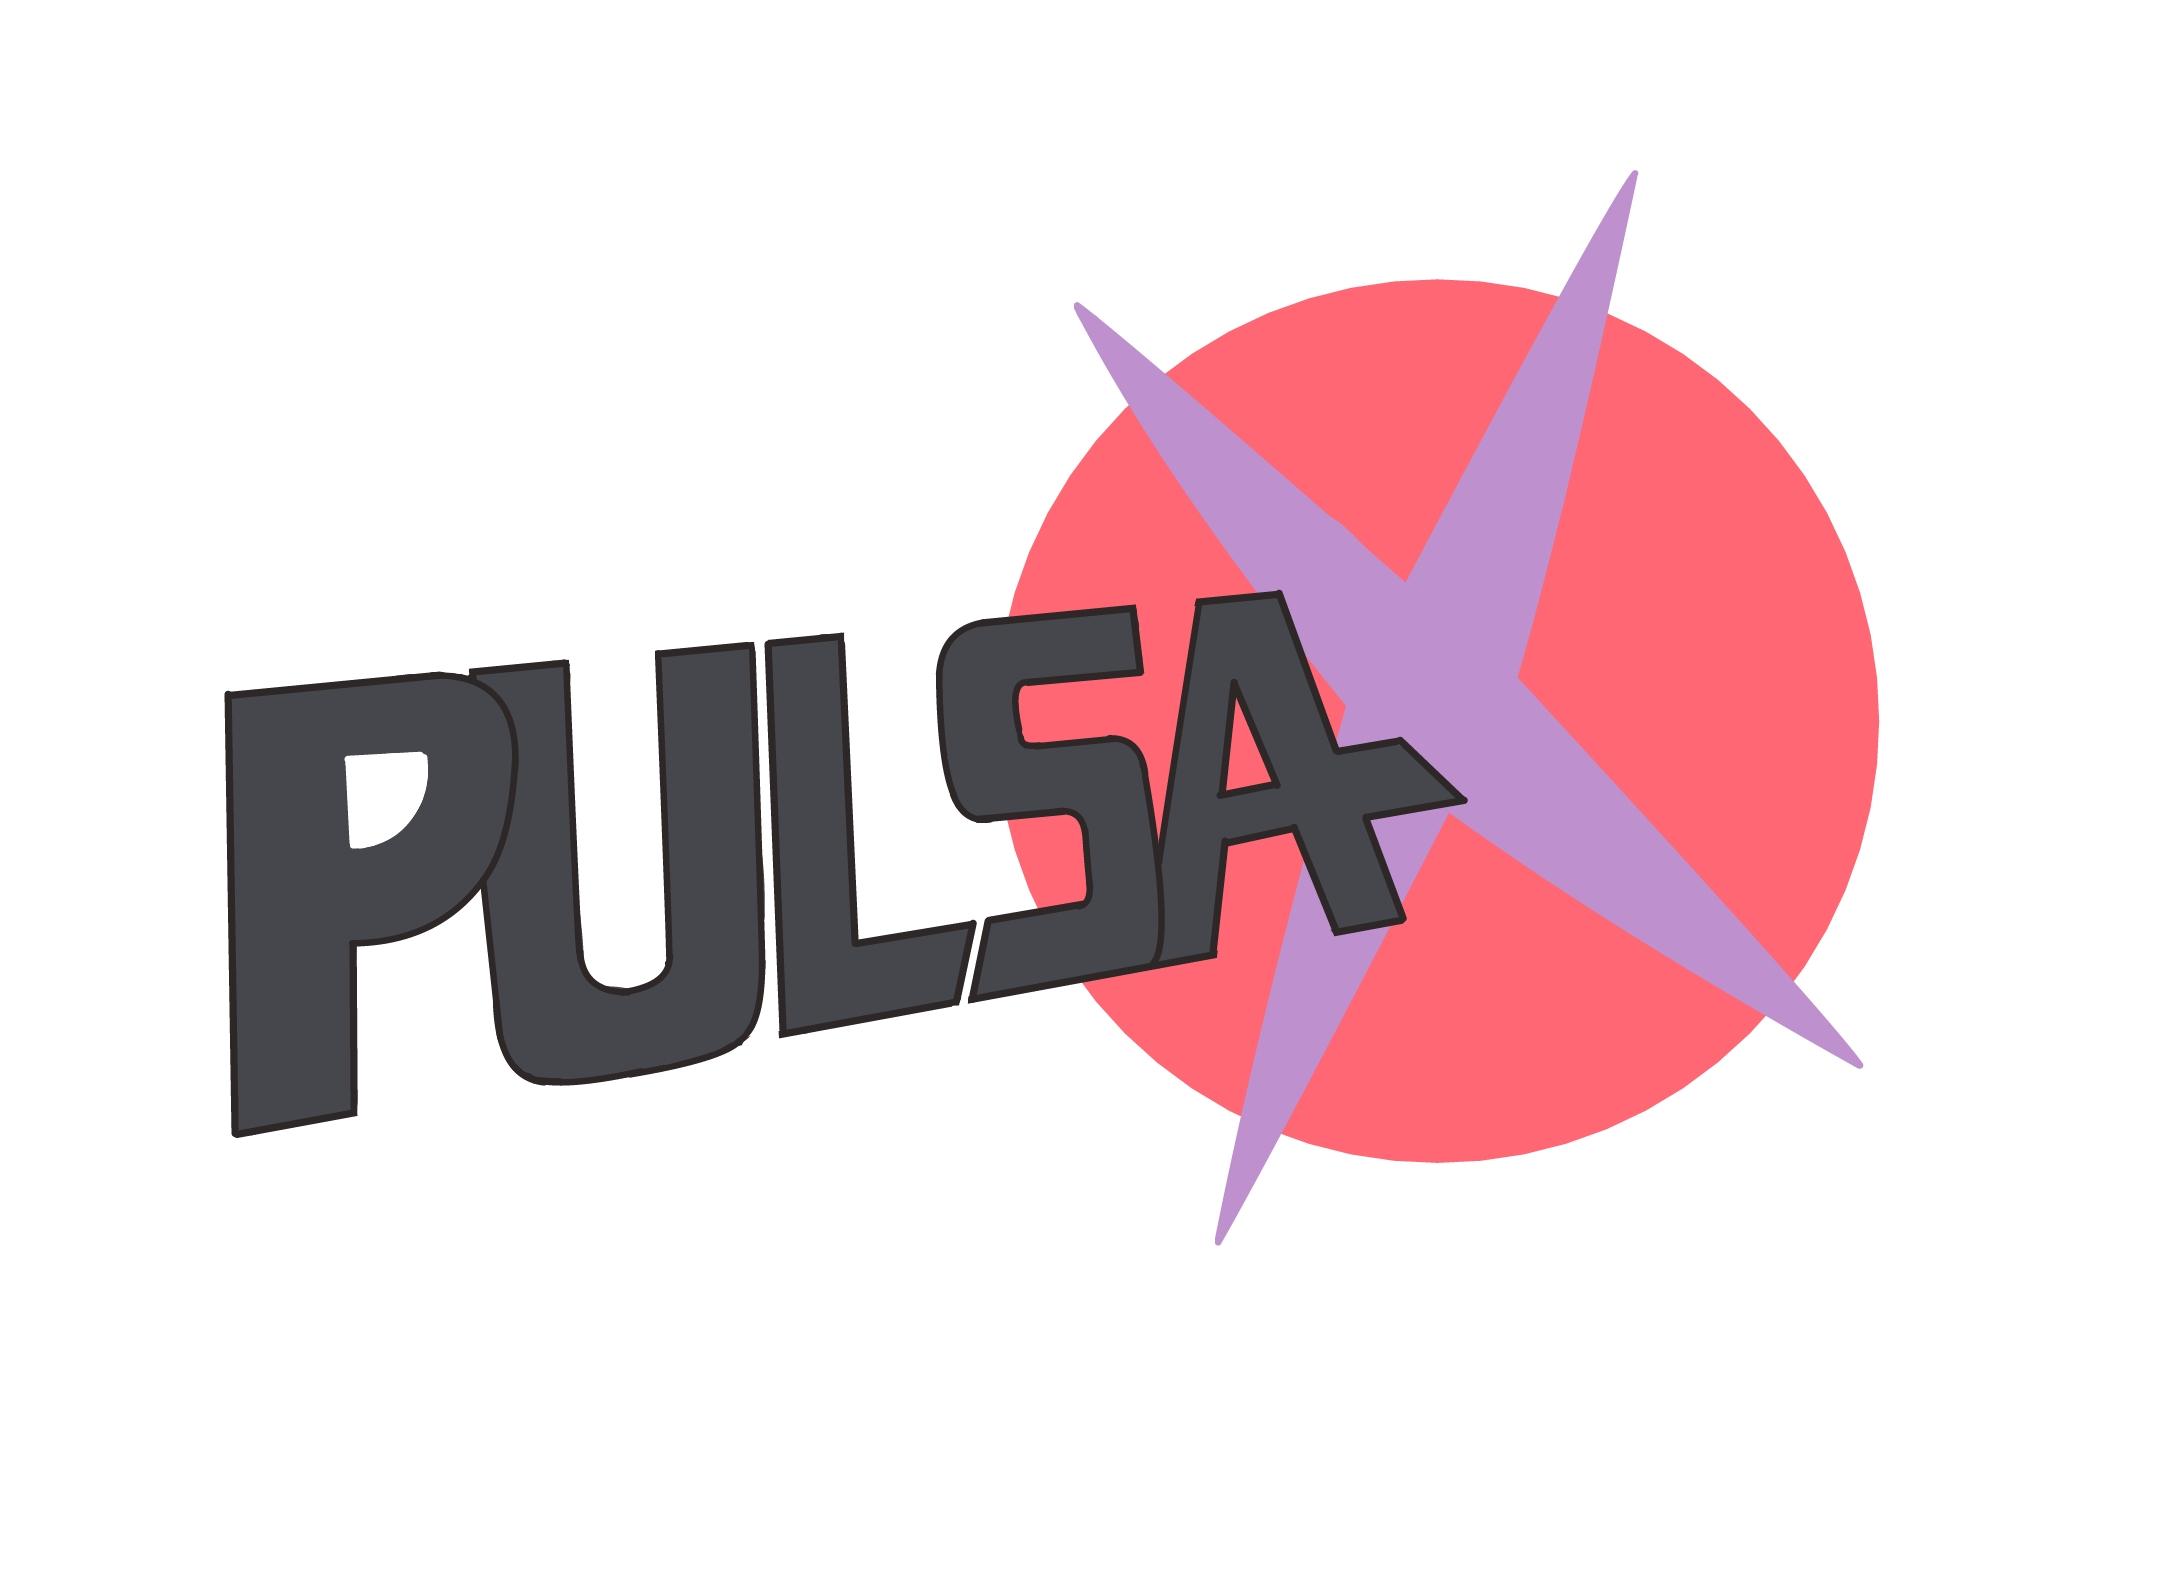 PULSAX-PROGRAMA12